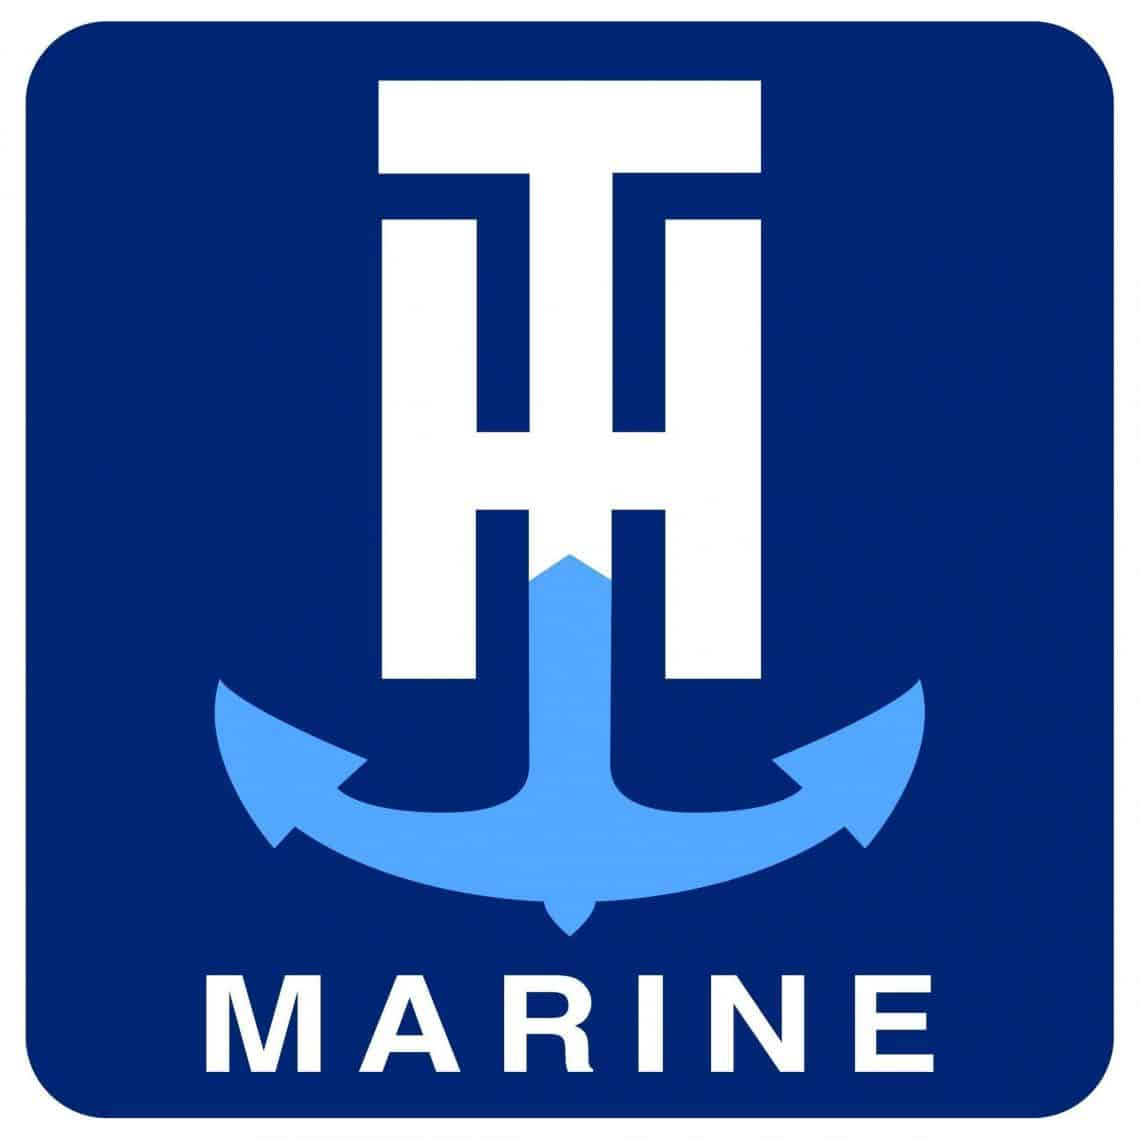 T-H Marine